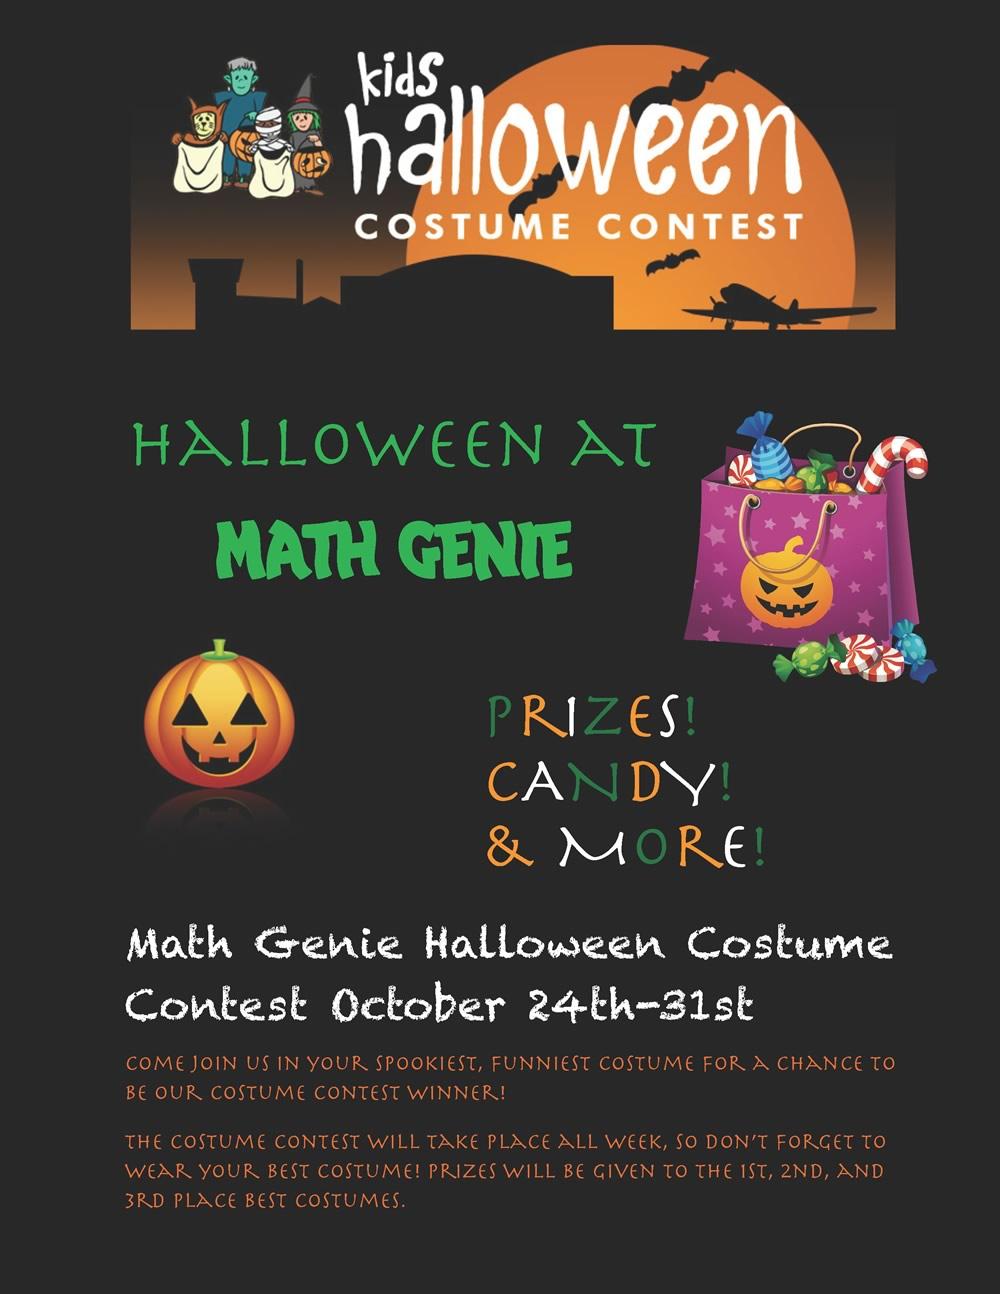 halloween_costume_contest_1-01.jpg